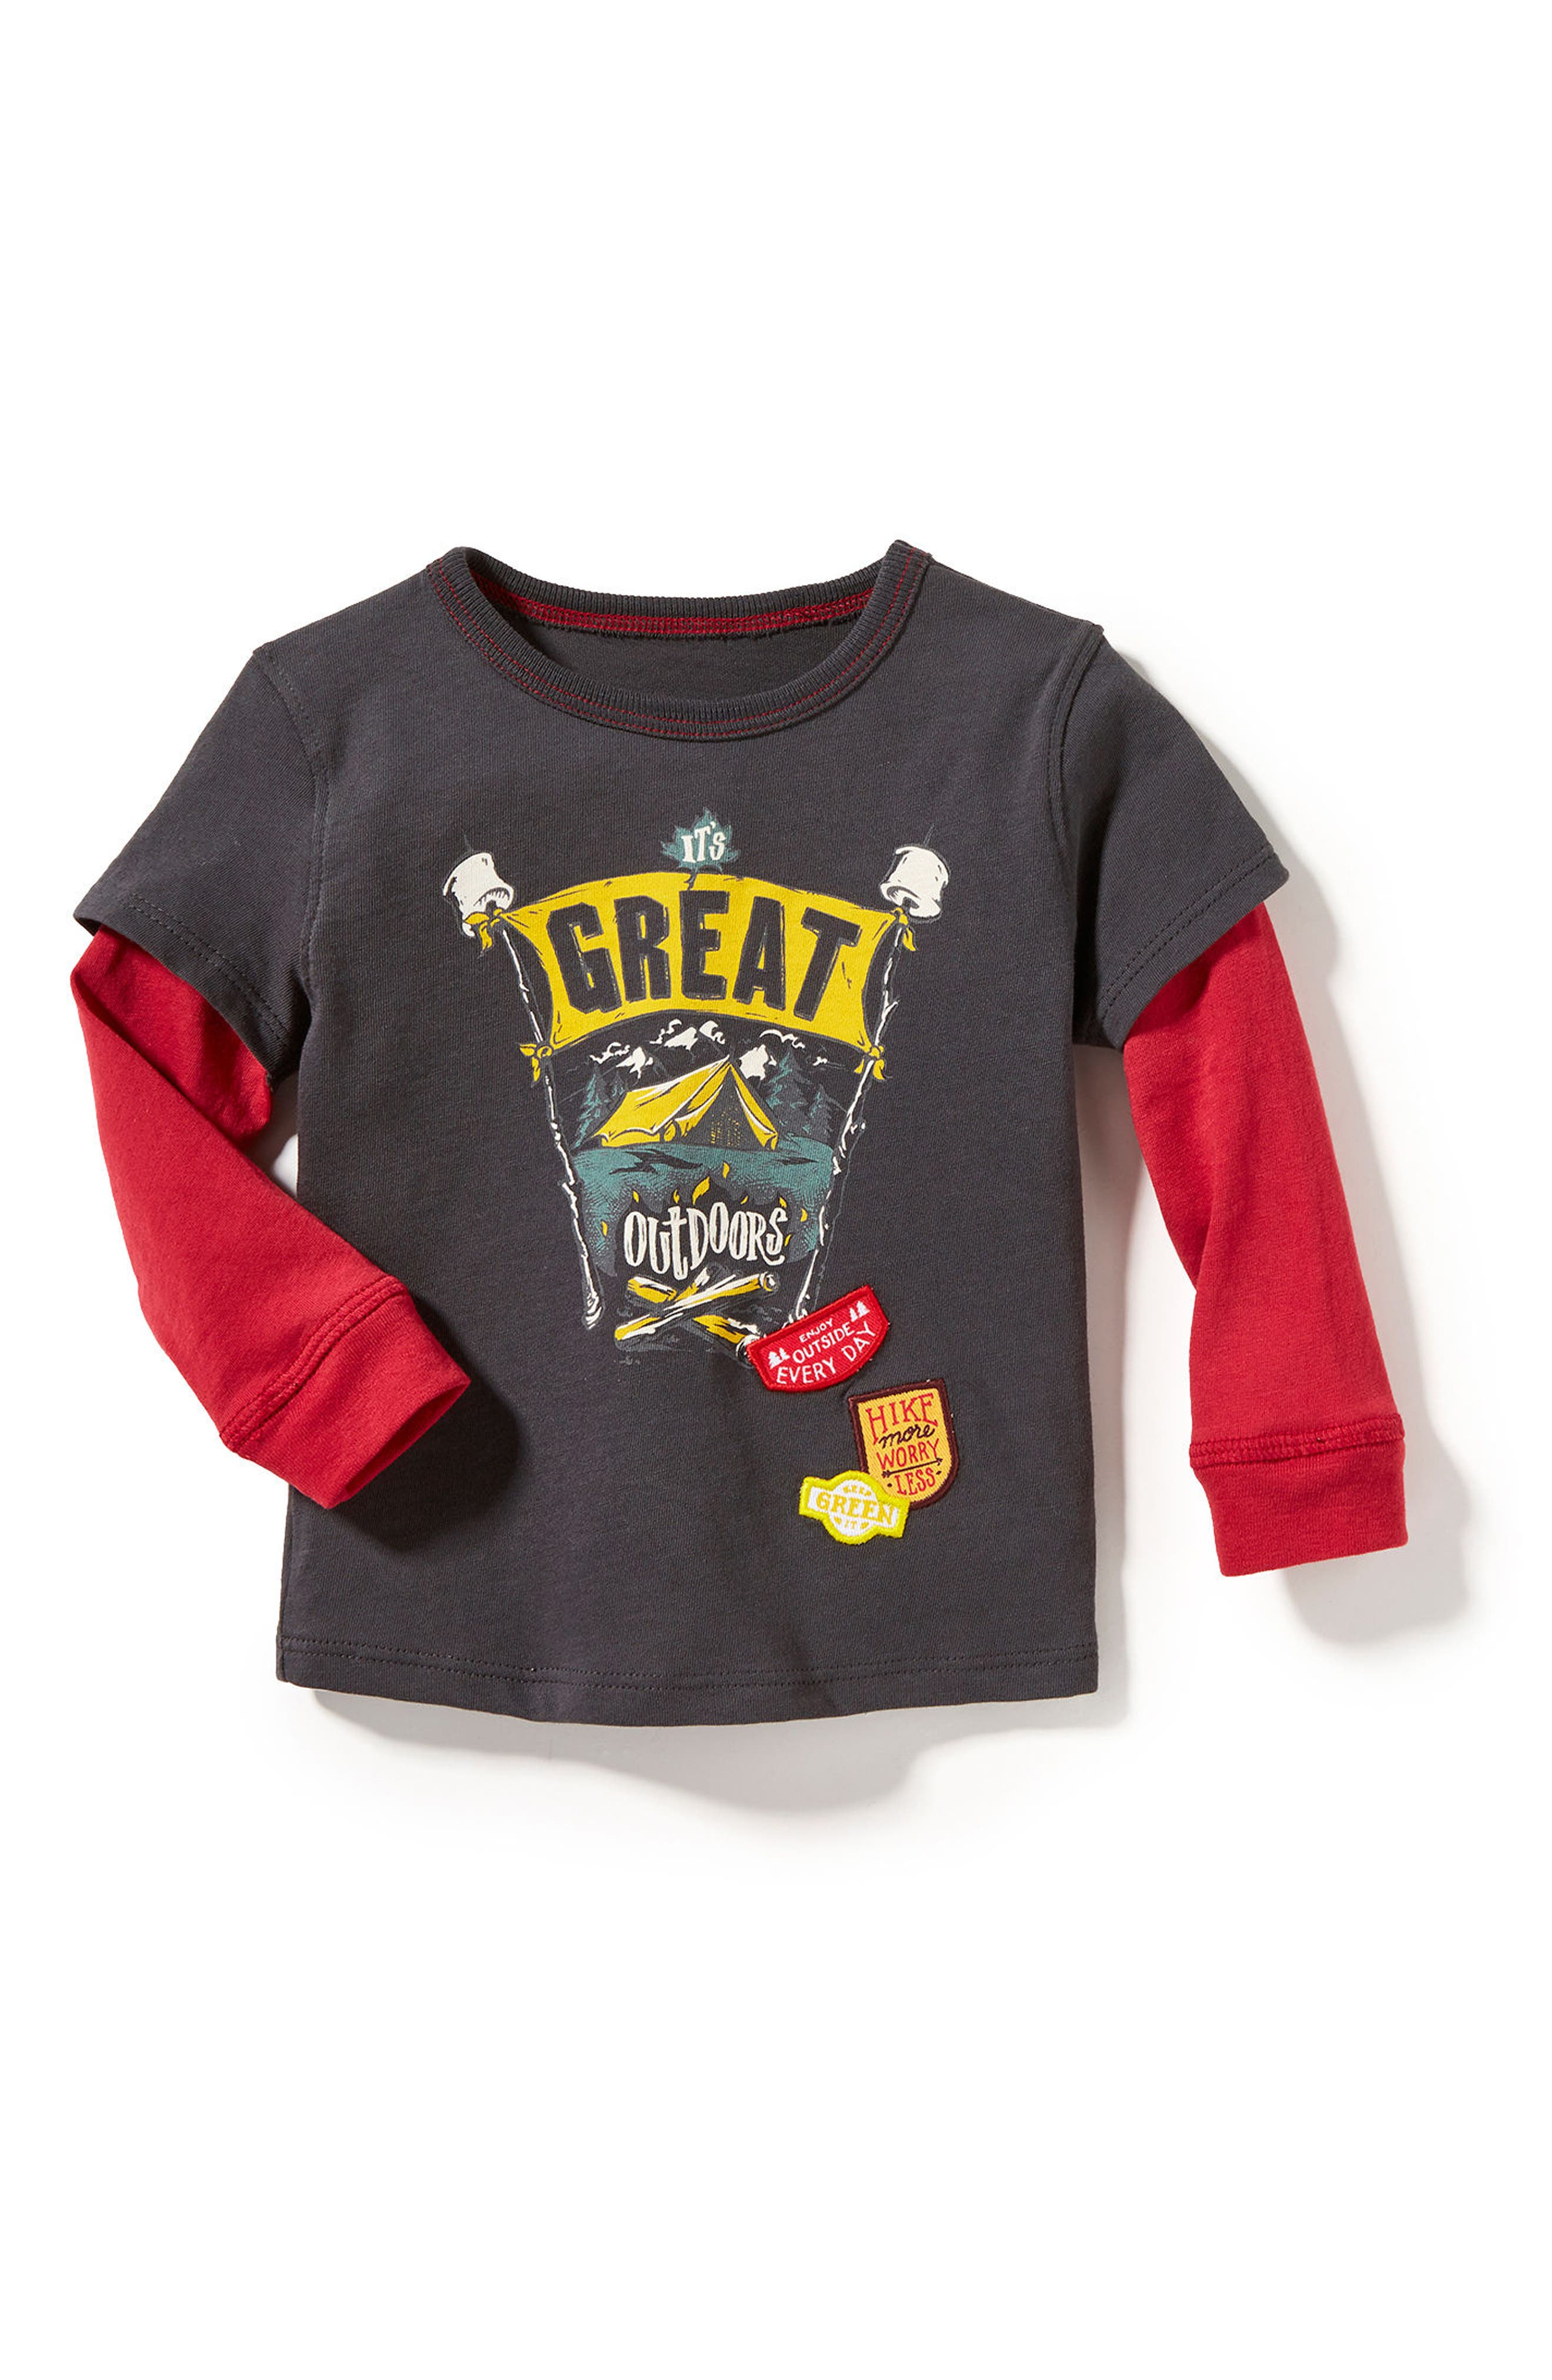 Main Image - Peek Great Outdoors T-Shirt (Baby Boys)